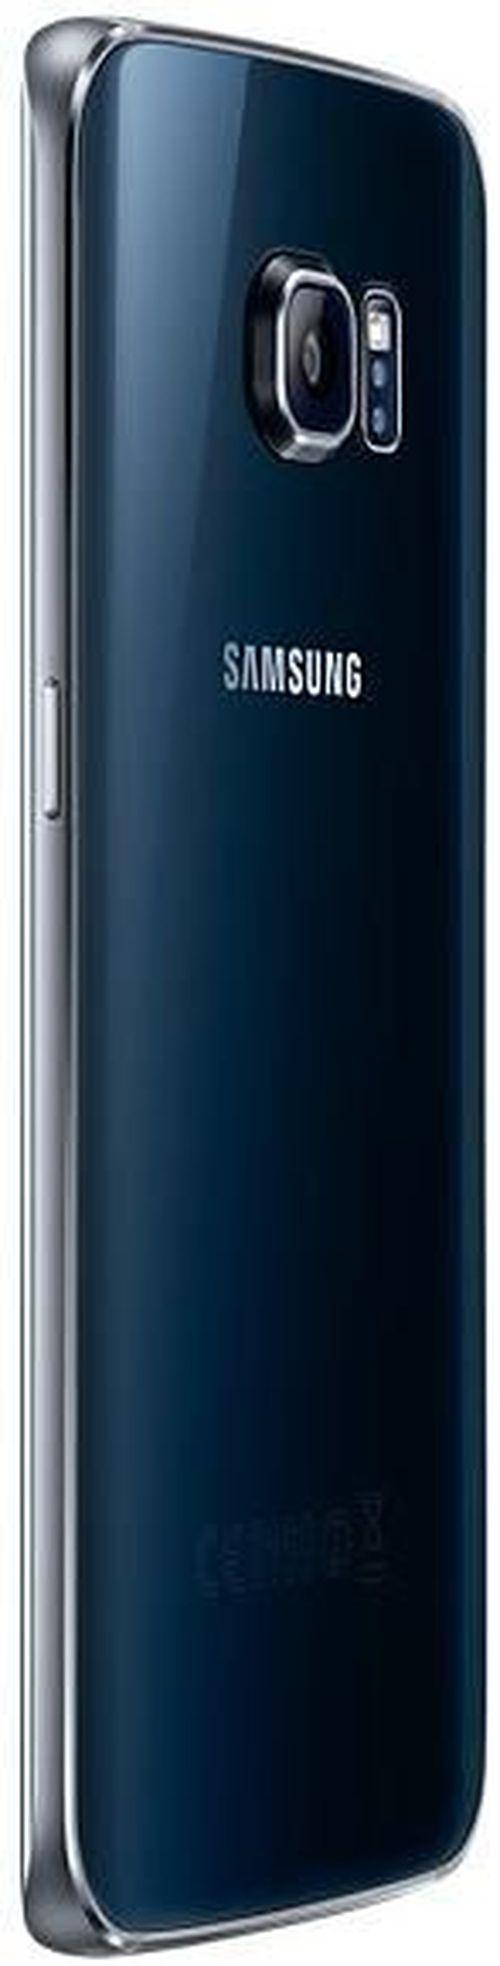 Smartphone Samsung G925F/DS Galaxy S6 EDGE 3GB/32GB Black